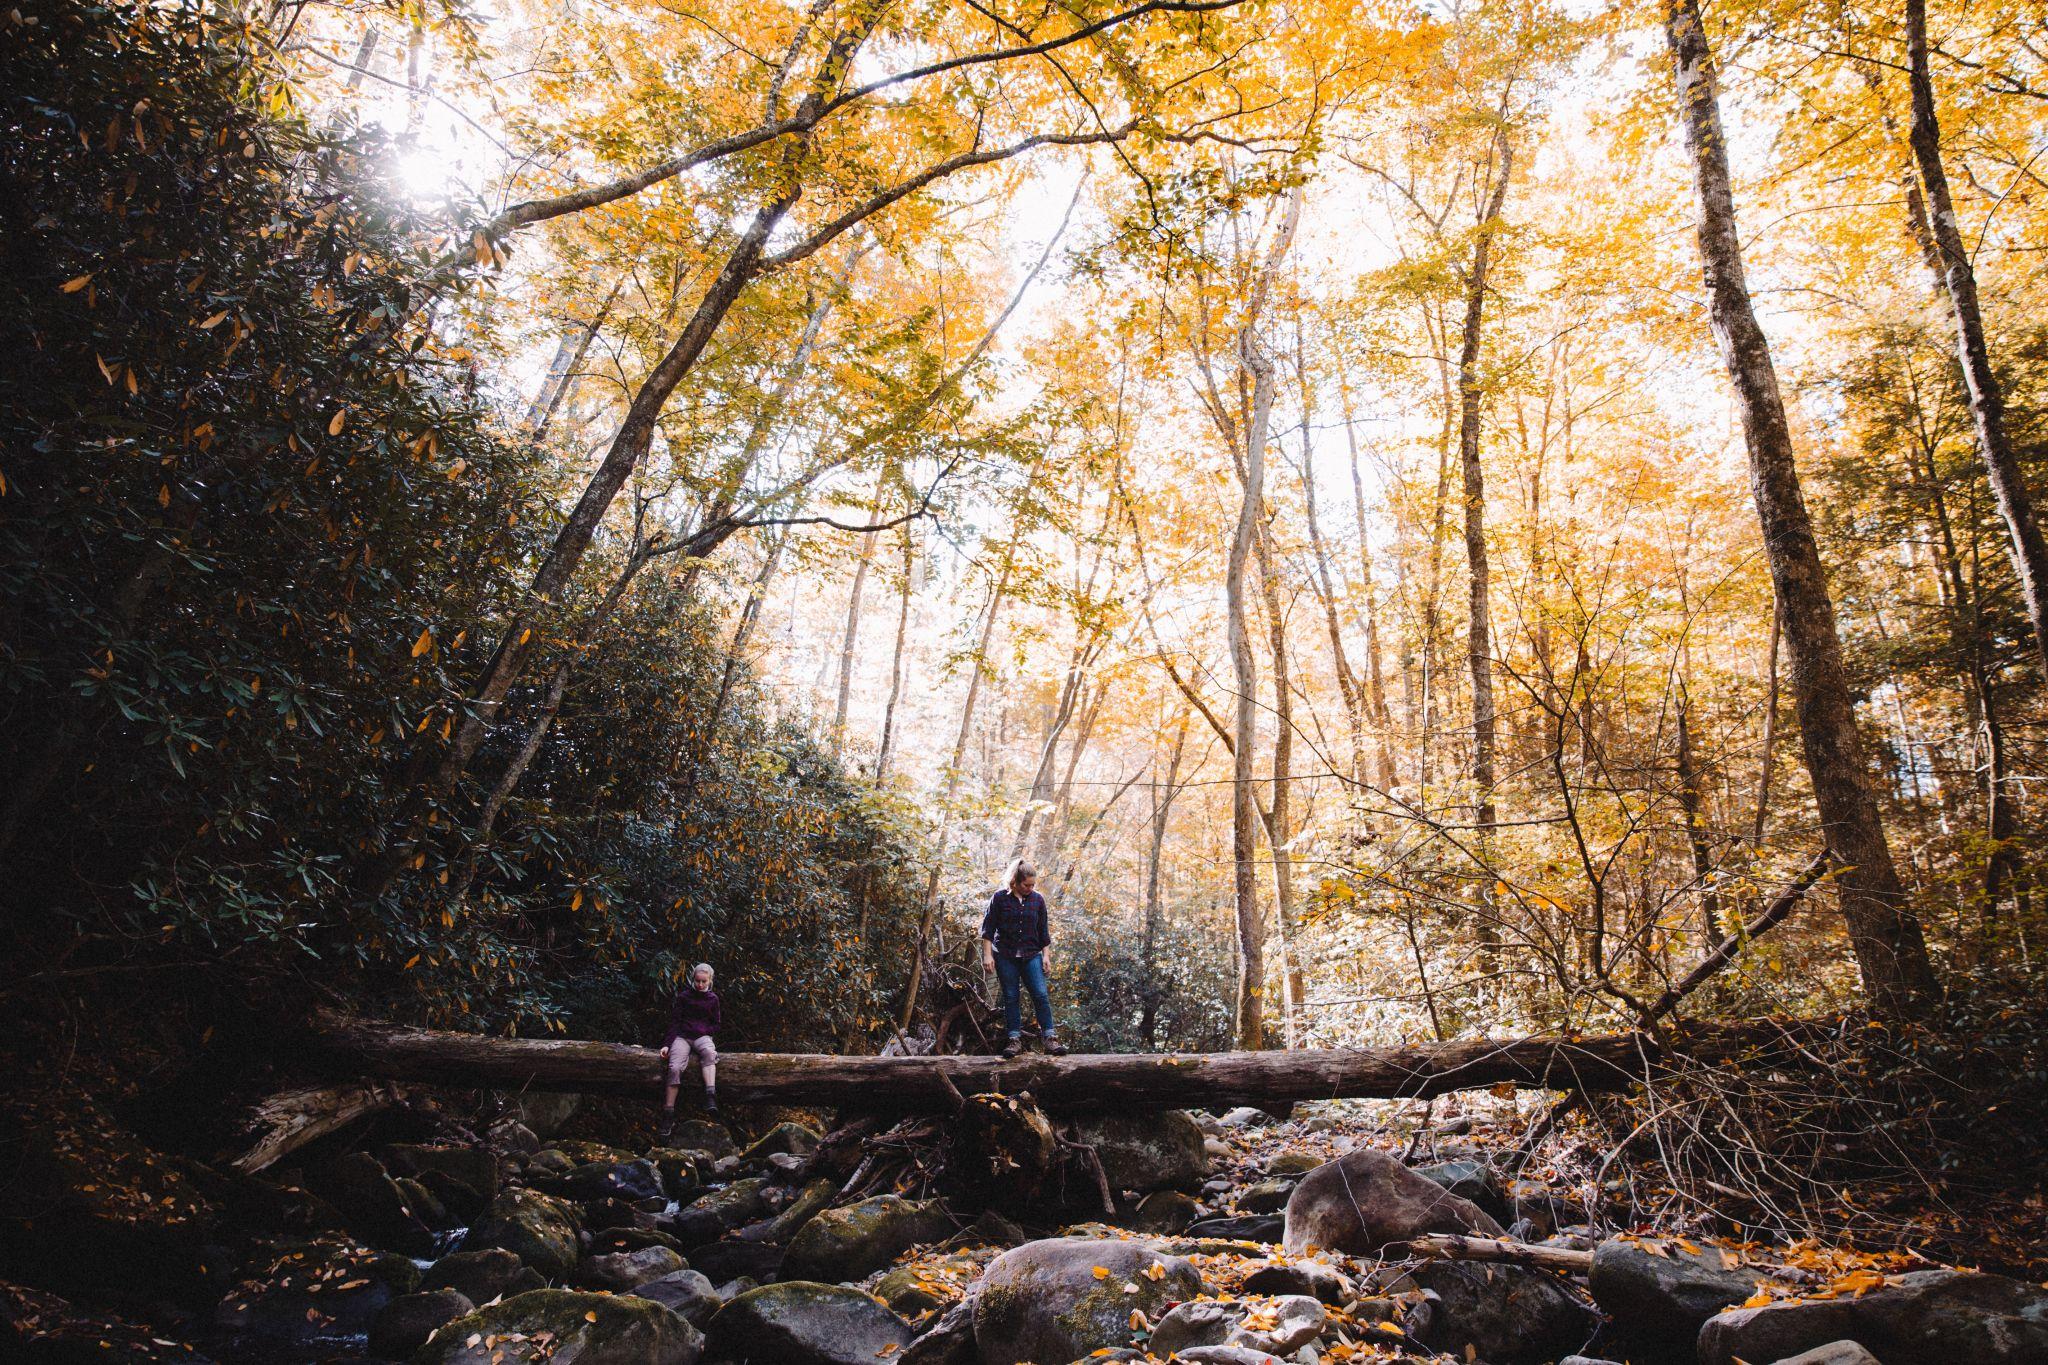 Raus in die Natur In den Bergen erleben Familien viel (c) Andrew Neel on Unsplash